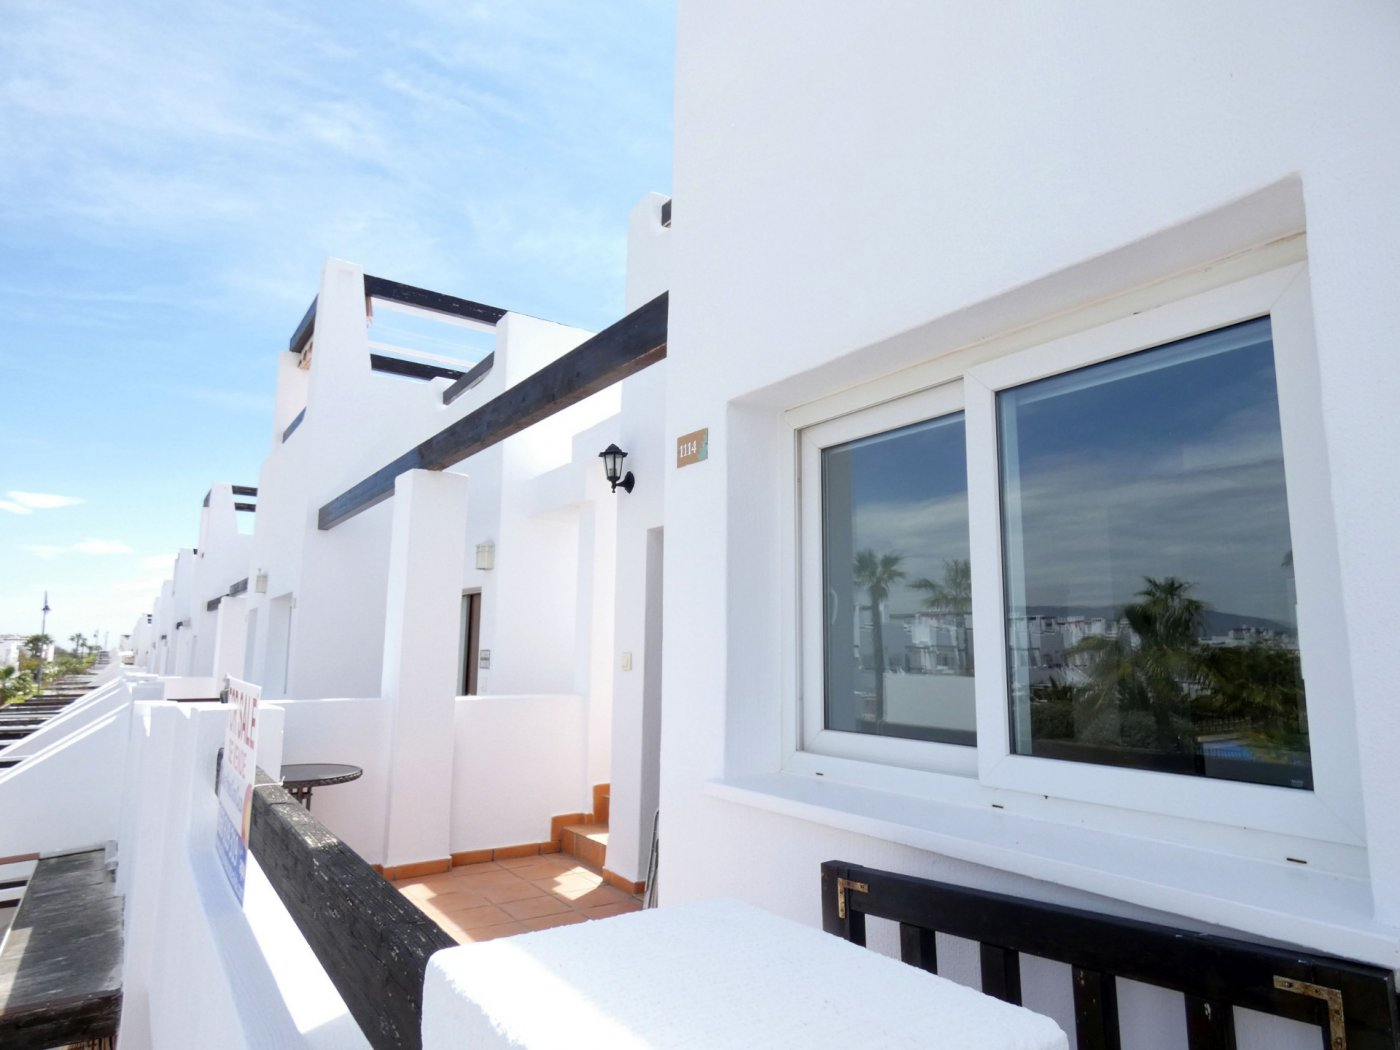 Gallery Image 13 of Key-Ready 2 Bedroom Apartment Overlooking the Citrus Groves in Jardin 10, Condado de Alhama